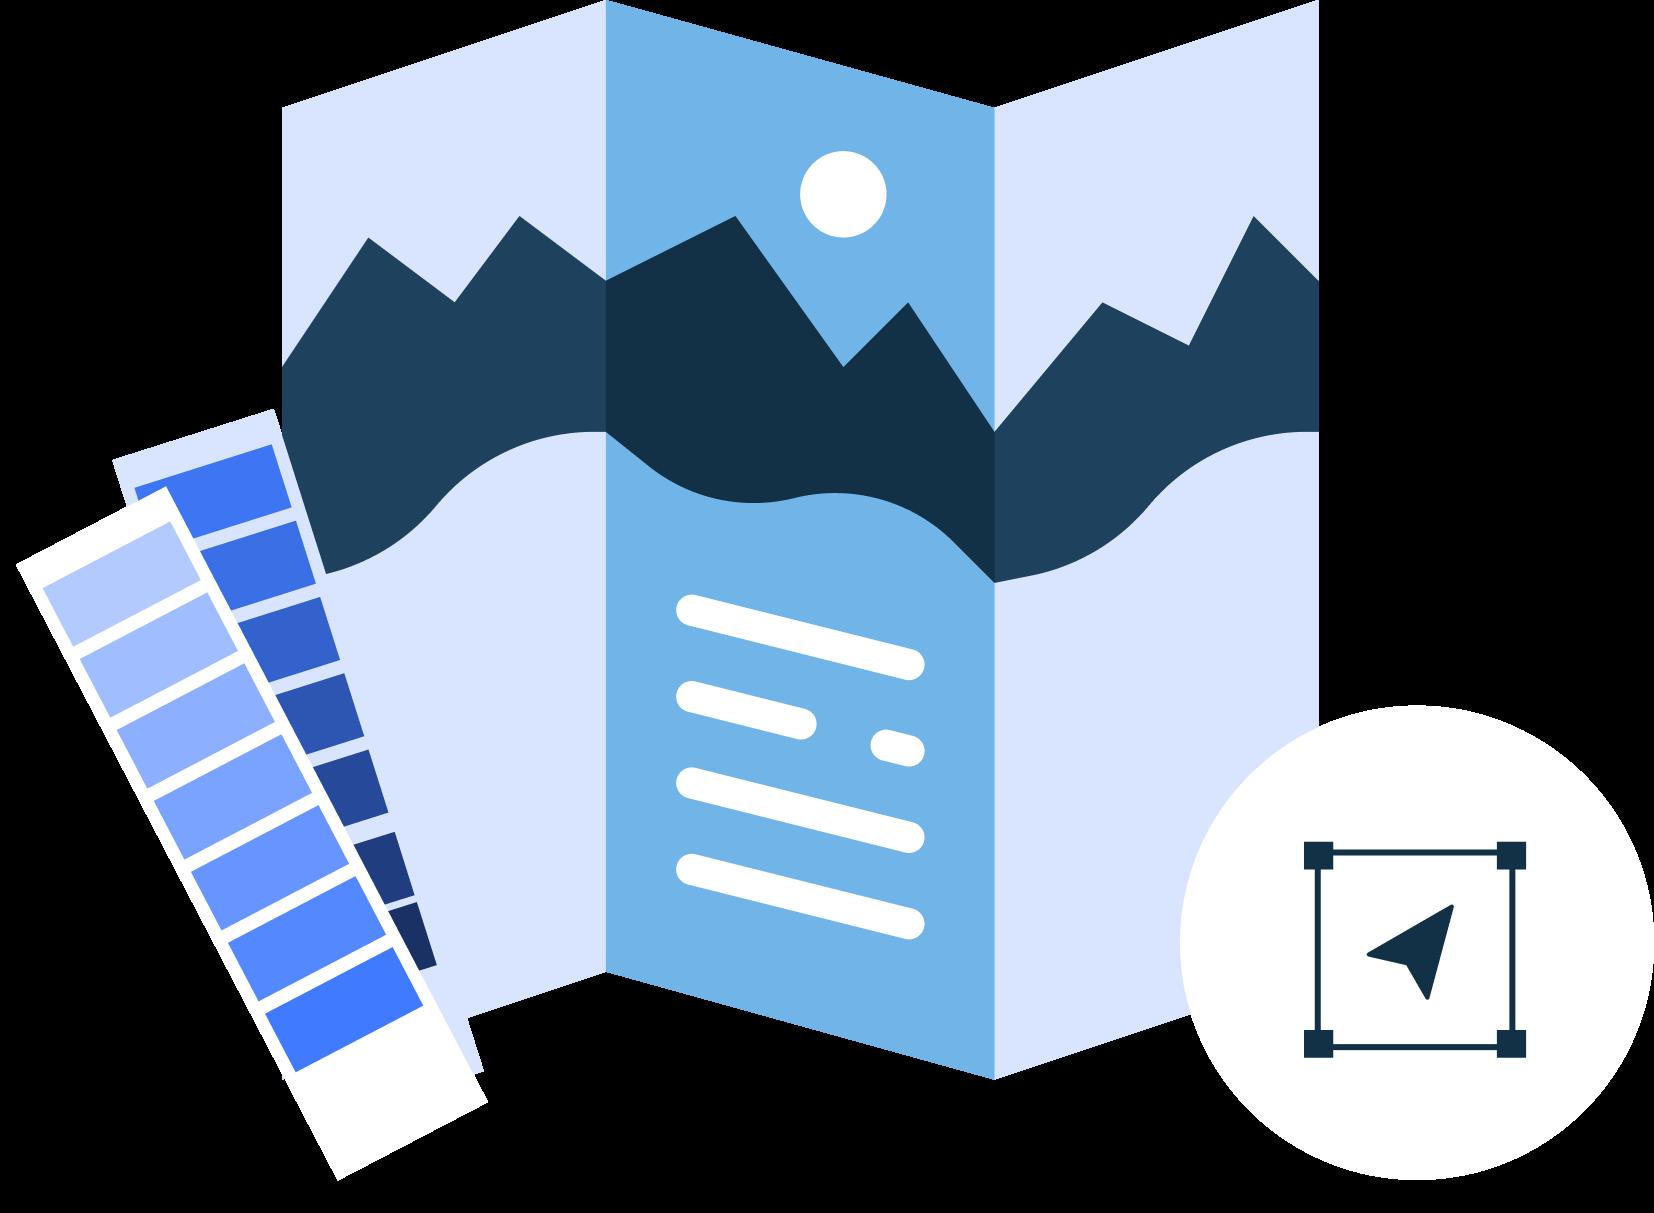 Print design graphic for design services